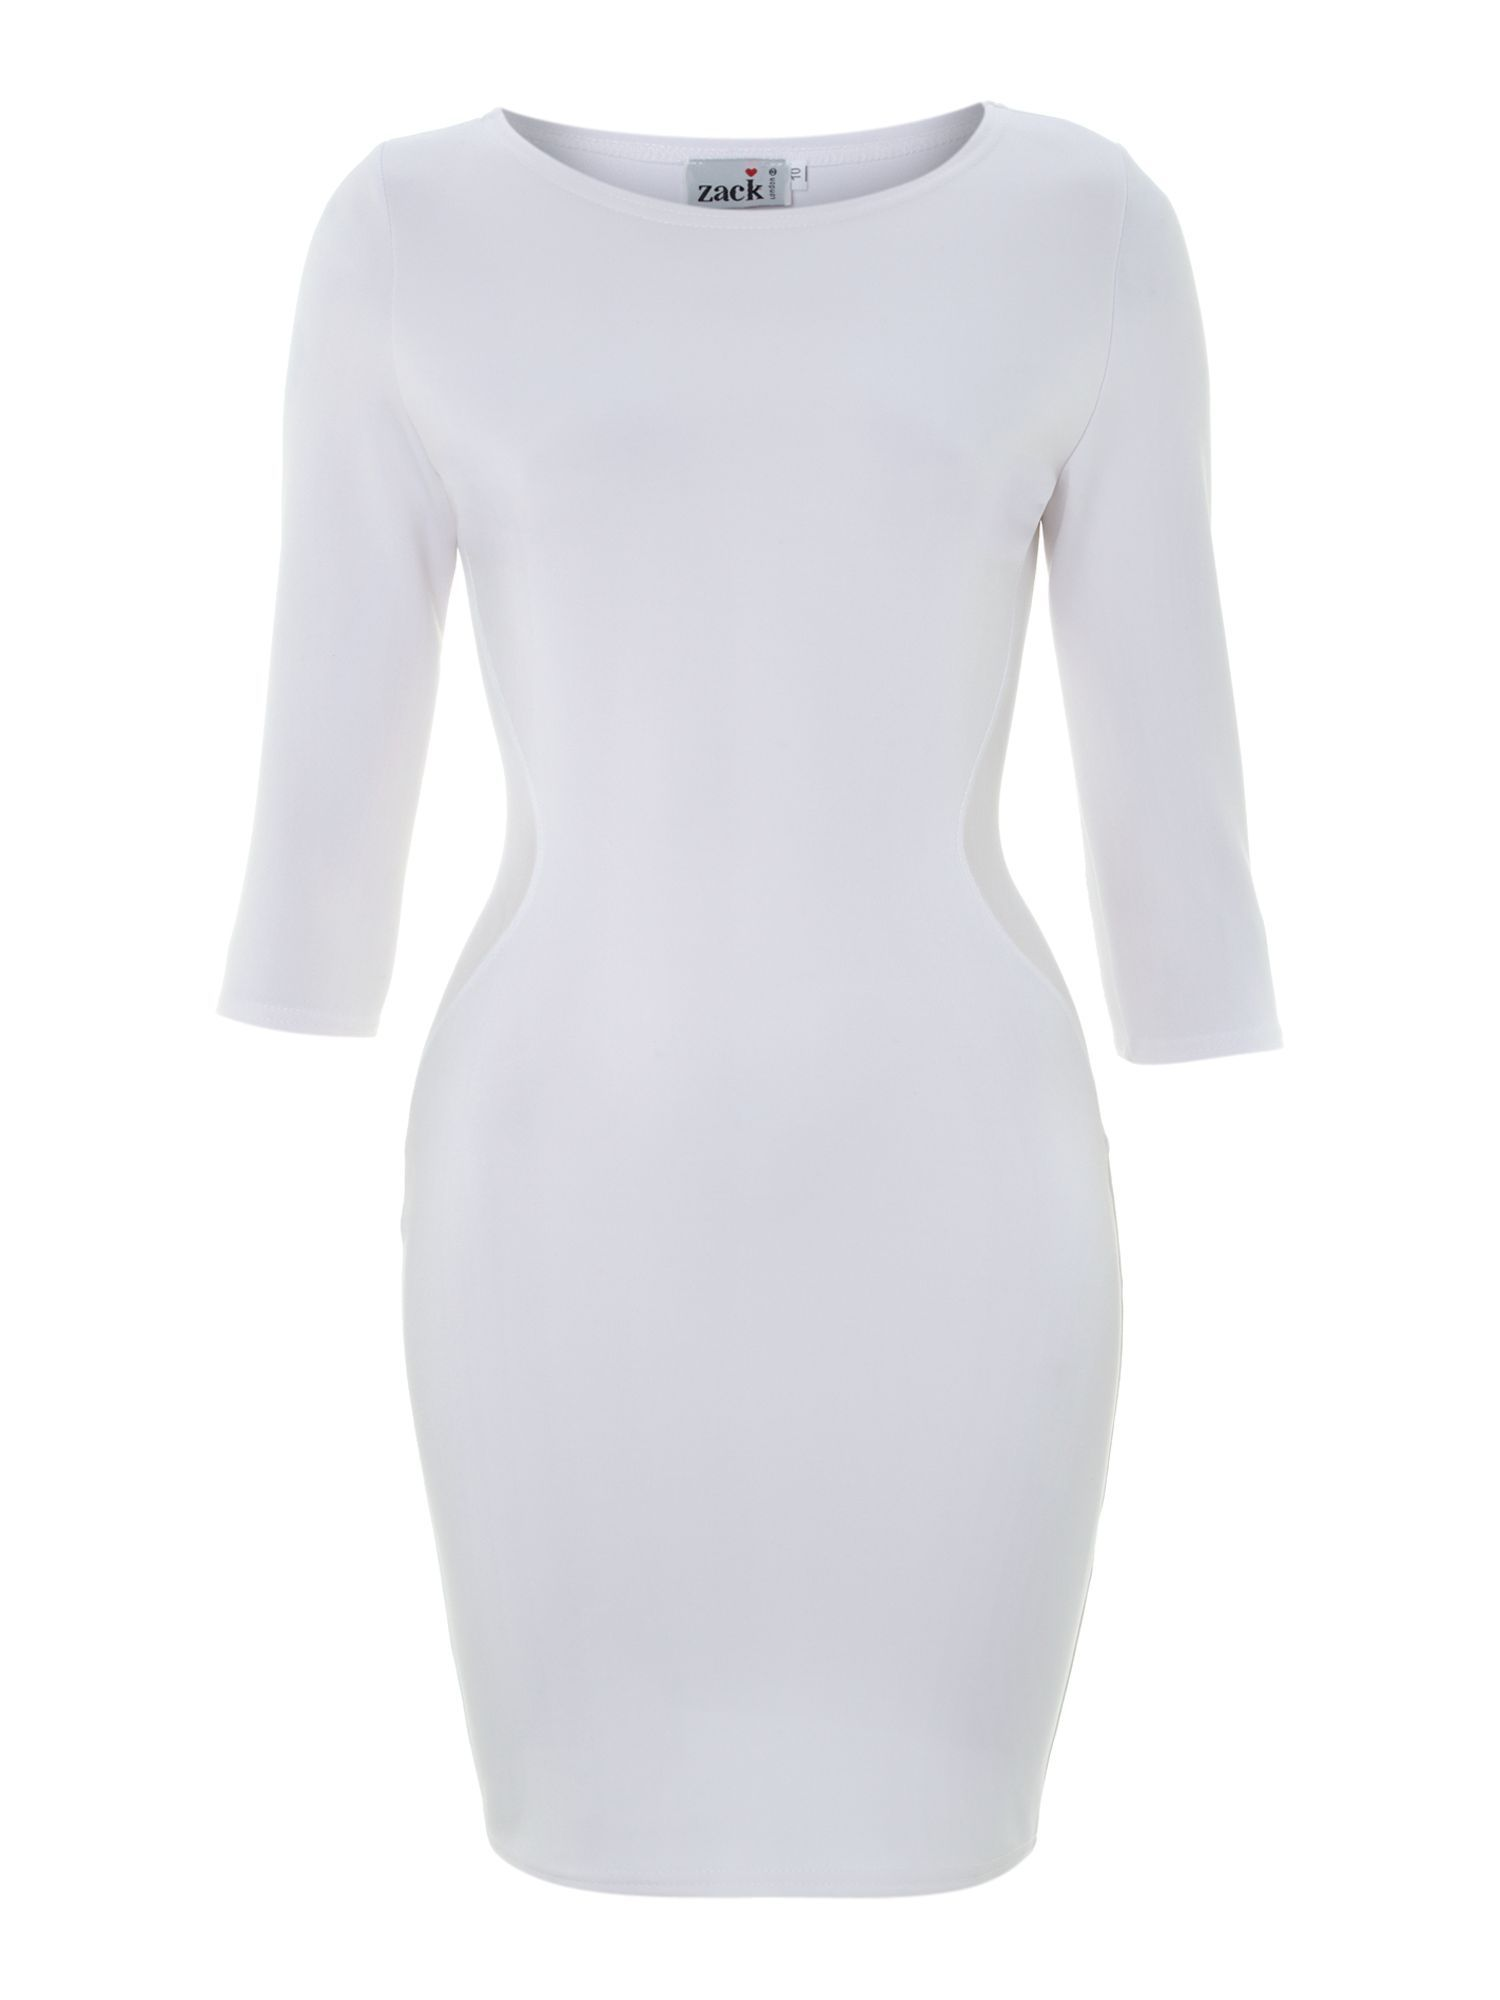 Bodycon White Dress   Fashion Outlet Review   Fashion ...